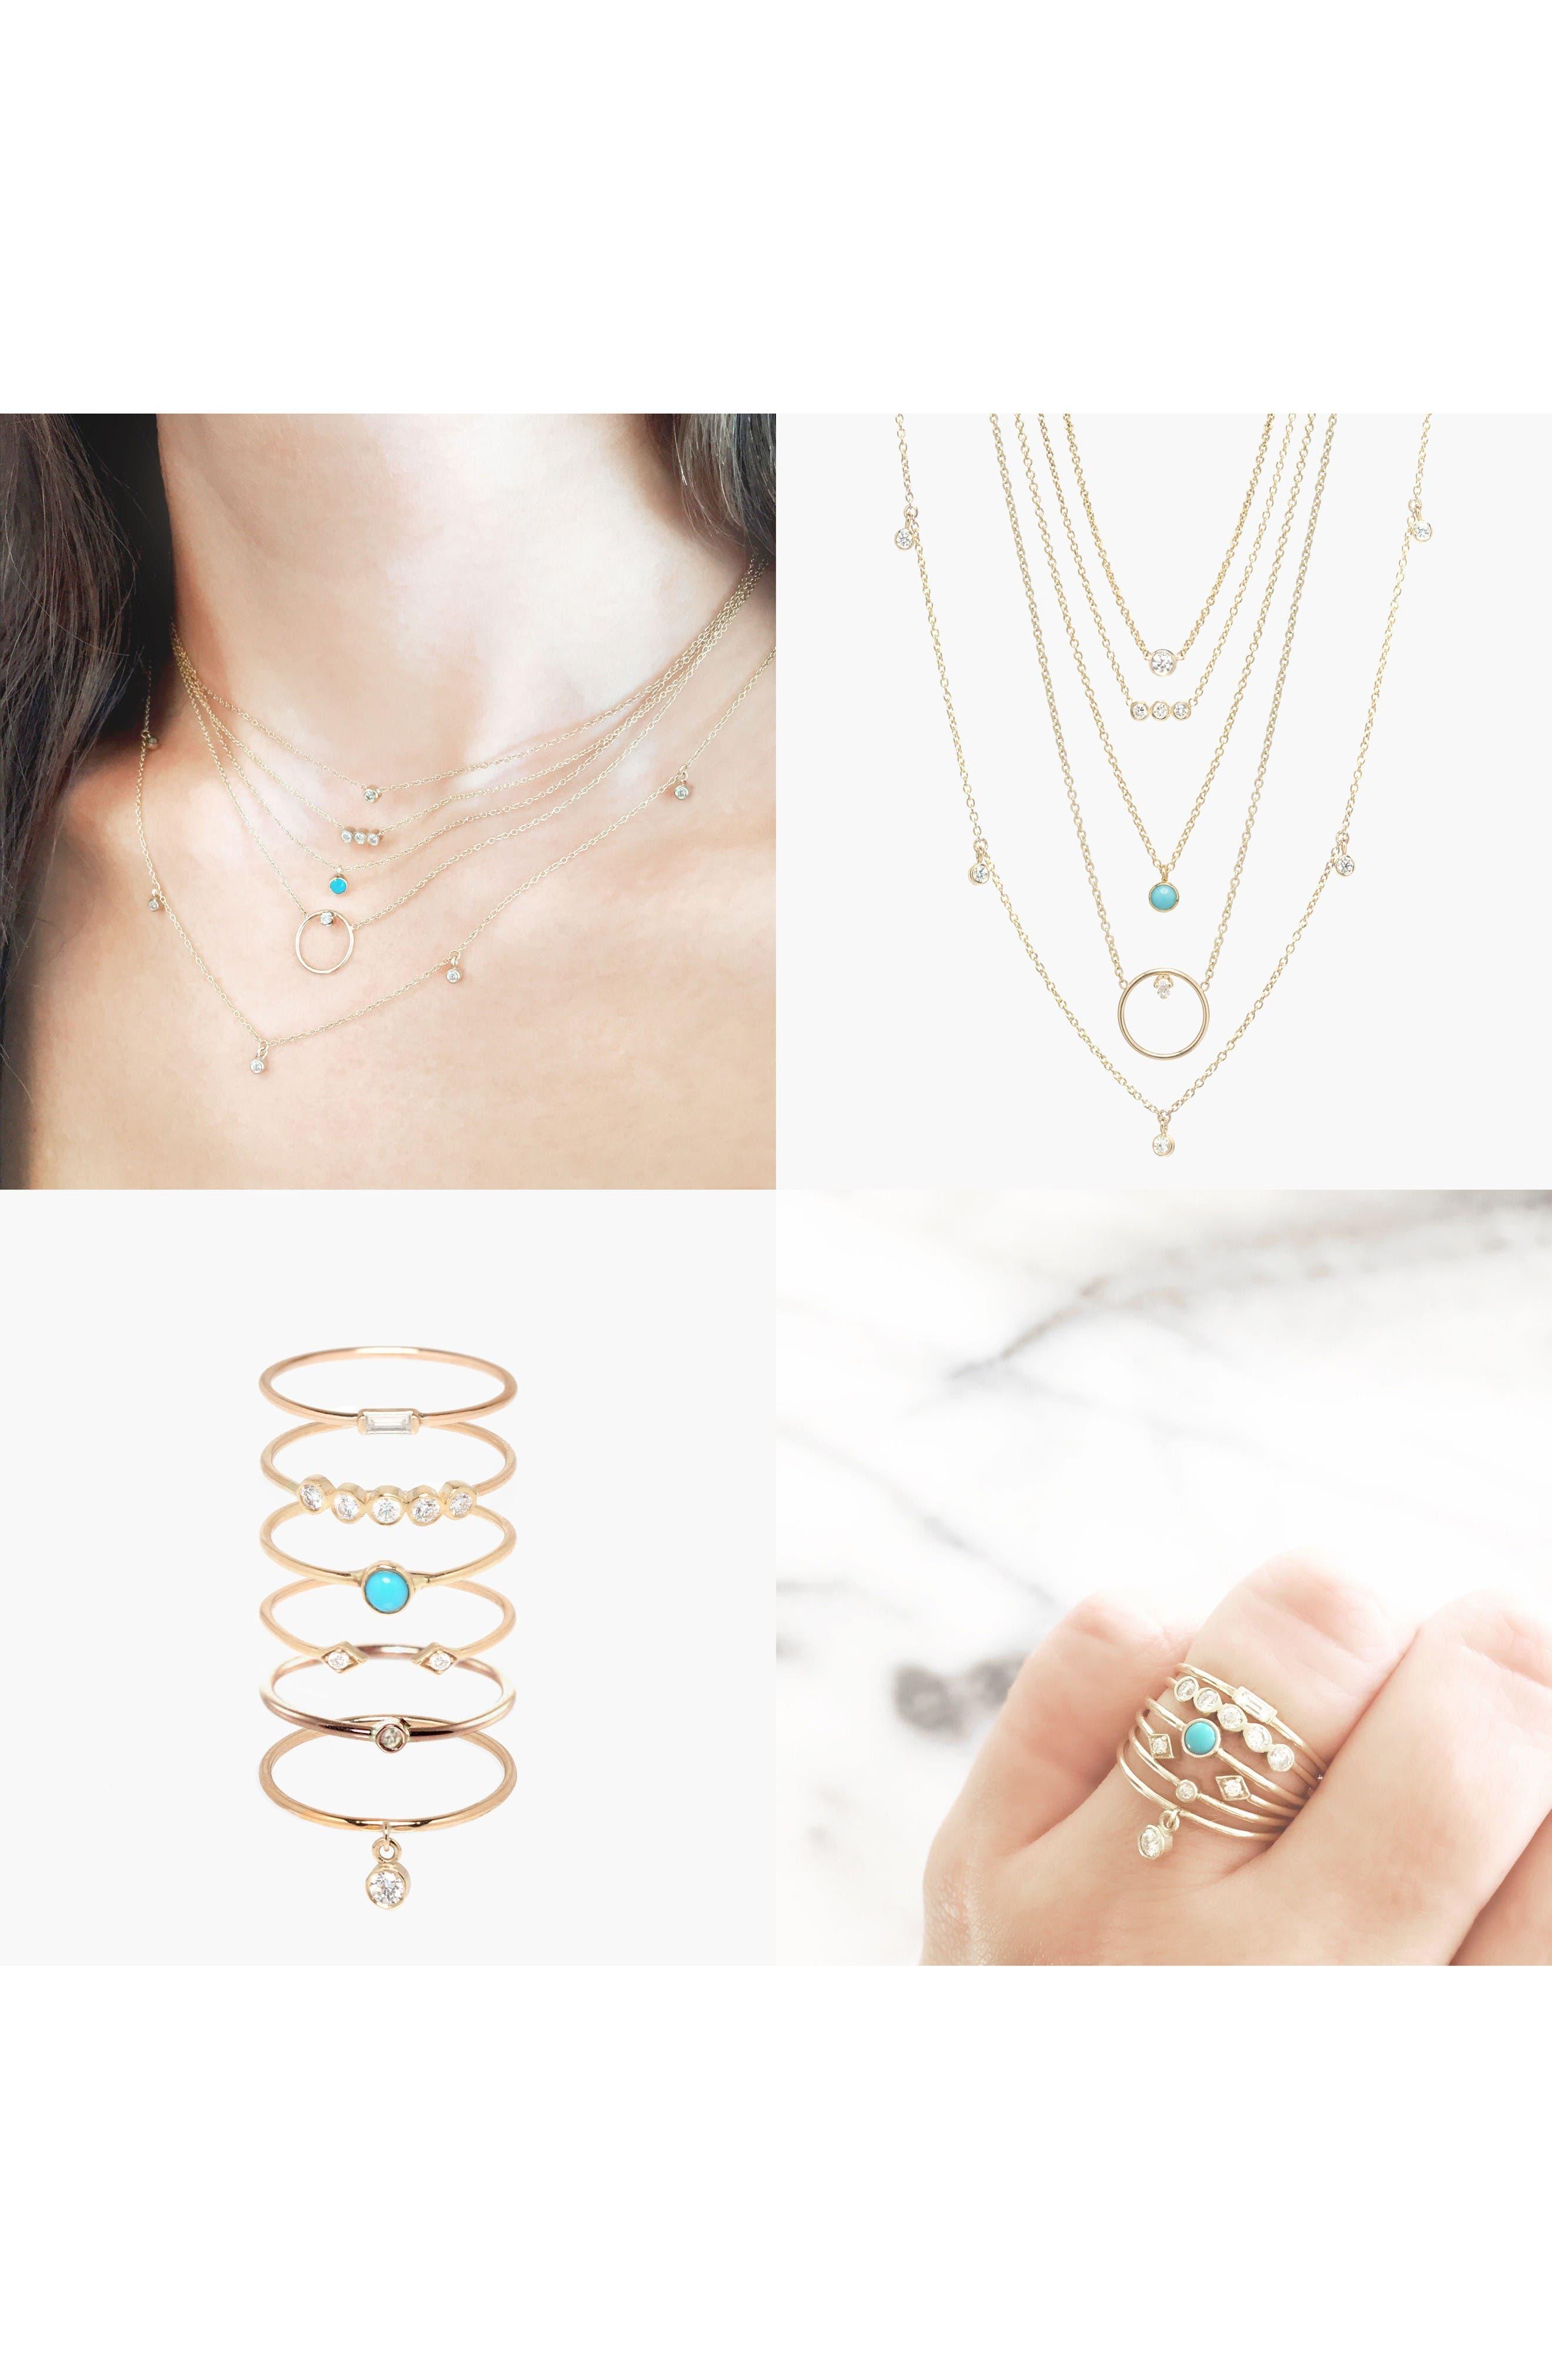 Diamond Bezel Pendant Necklace,                             Alternate thumbnail 3, color,                             YELLOW GOLD